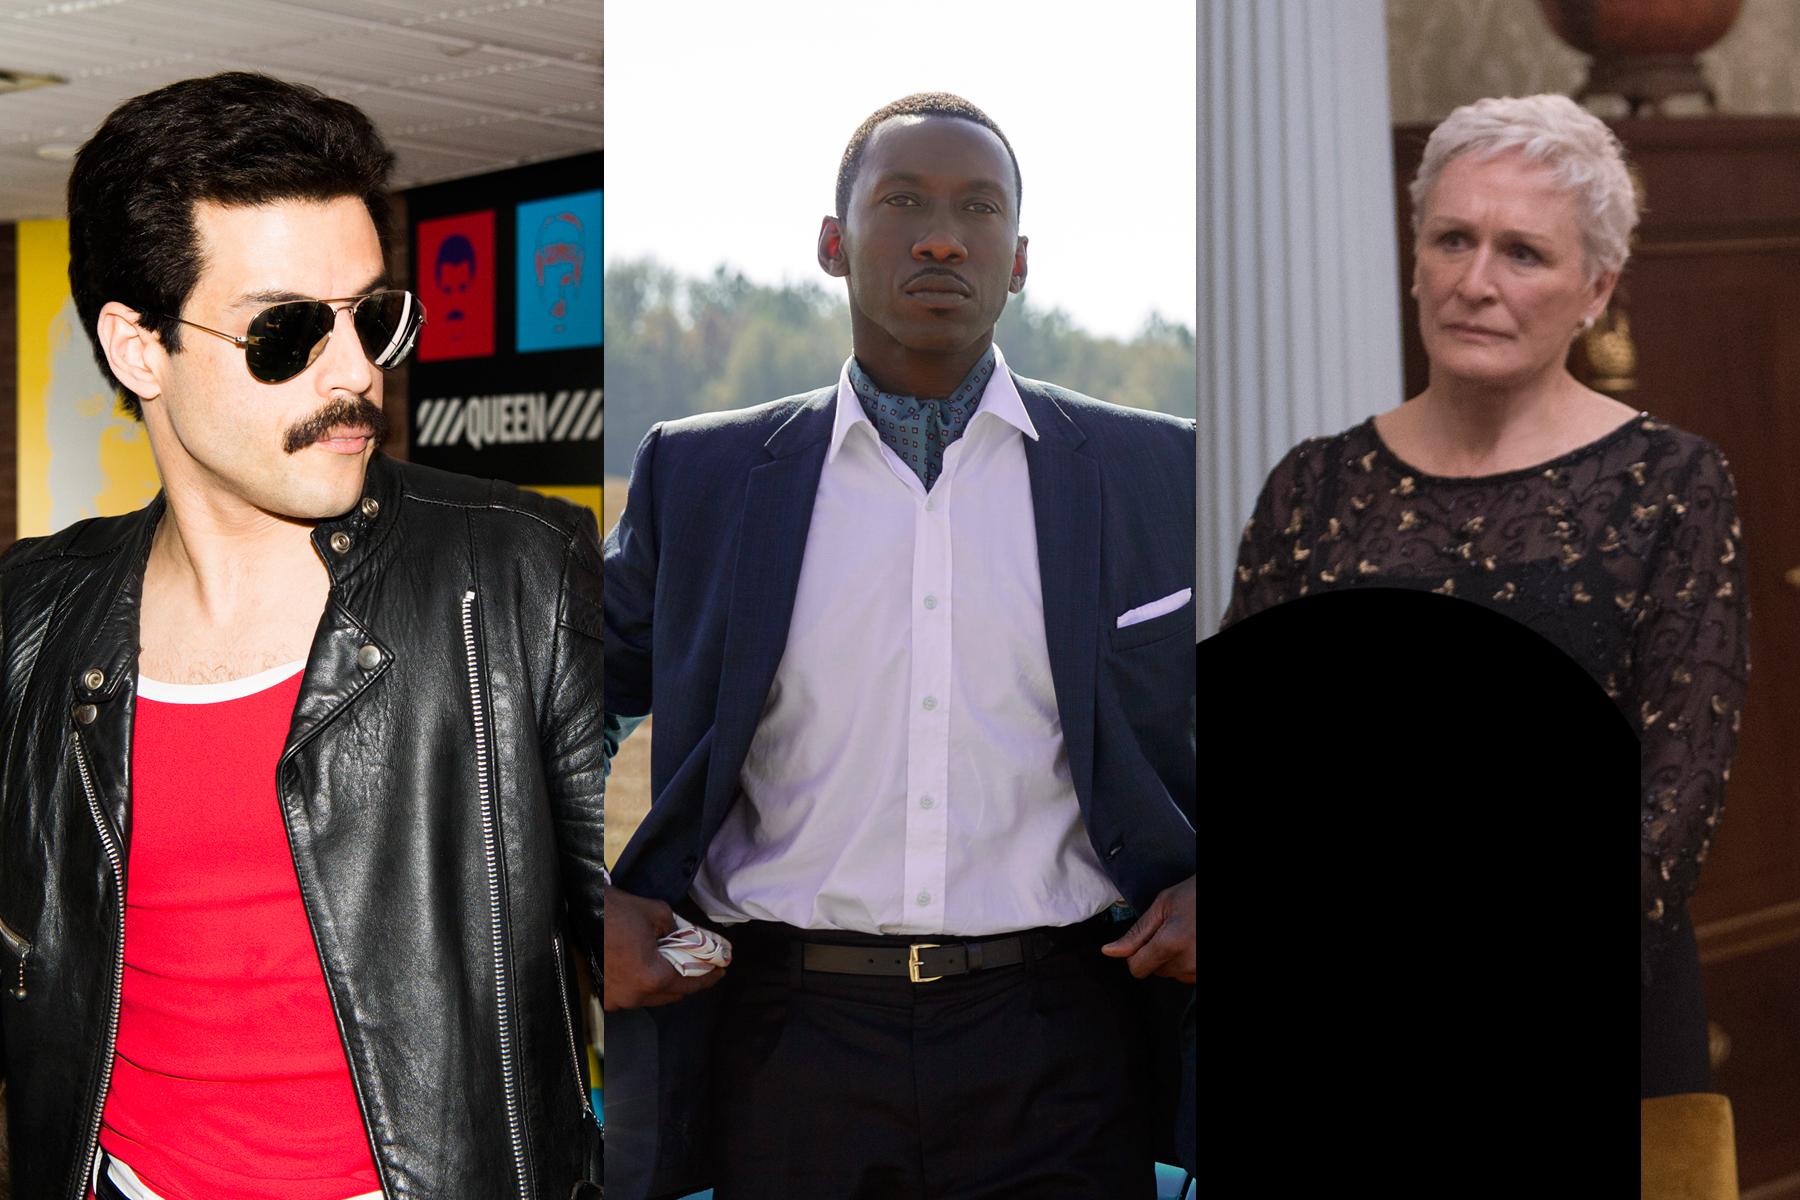 Rami Malek Mahershala Ali And Glenn Close Each Predicted To Win Oscars At The 91st Academy Awards